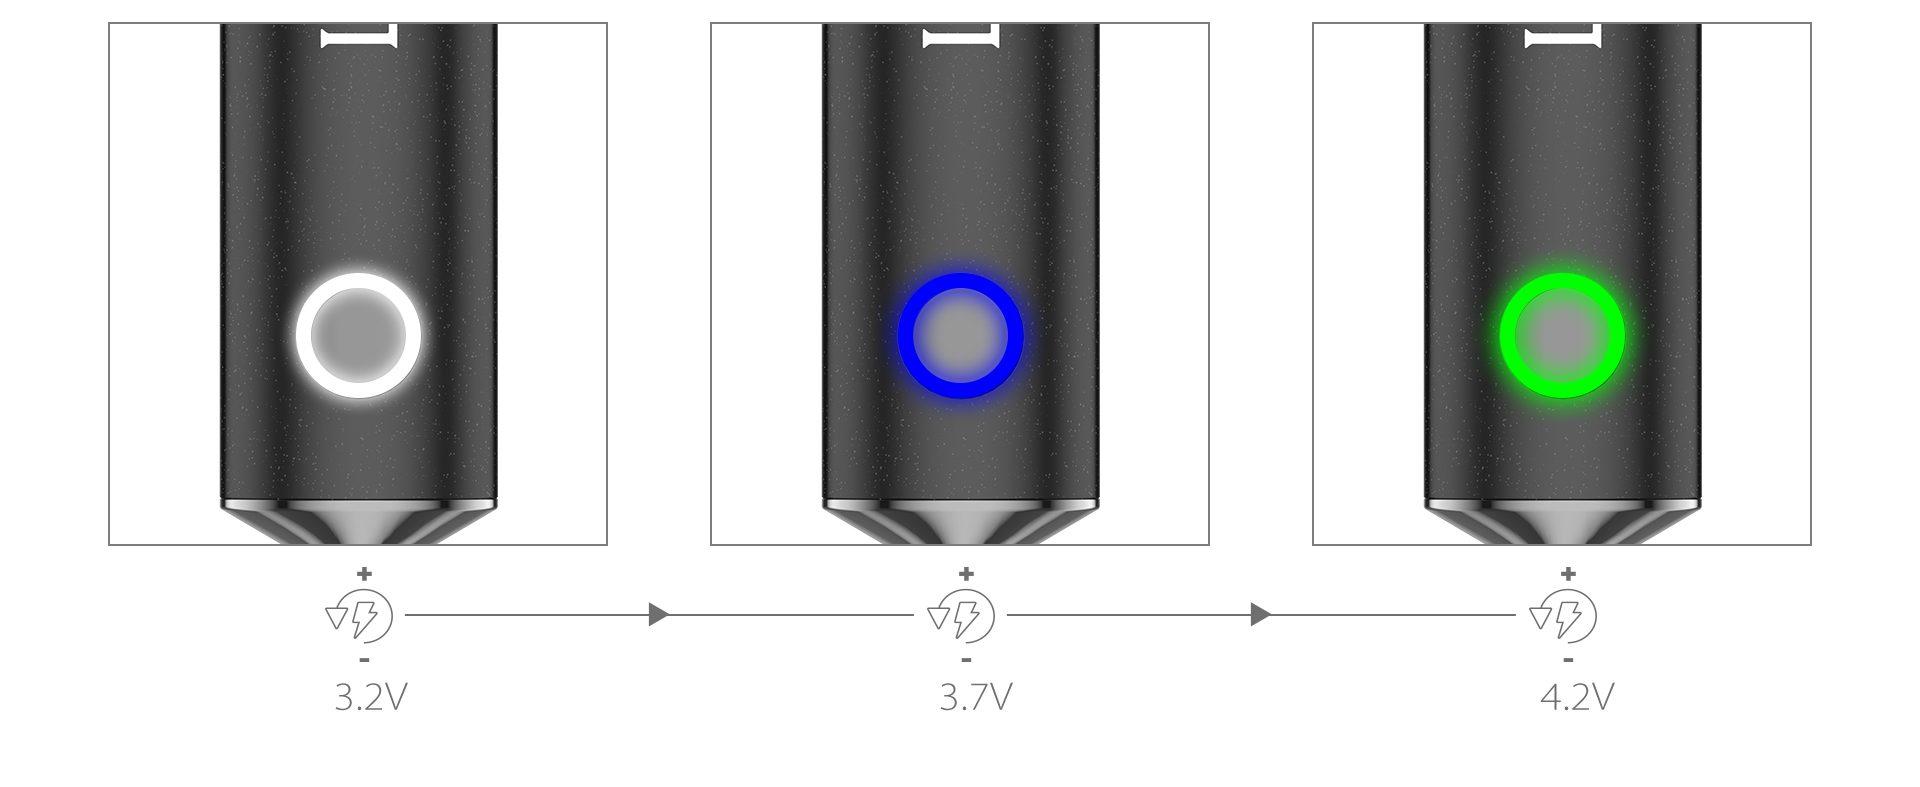 Yocan Loki Portable Vaporizer Pen Featured 3 voltage levels.